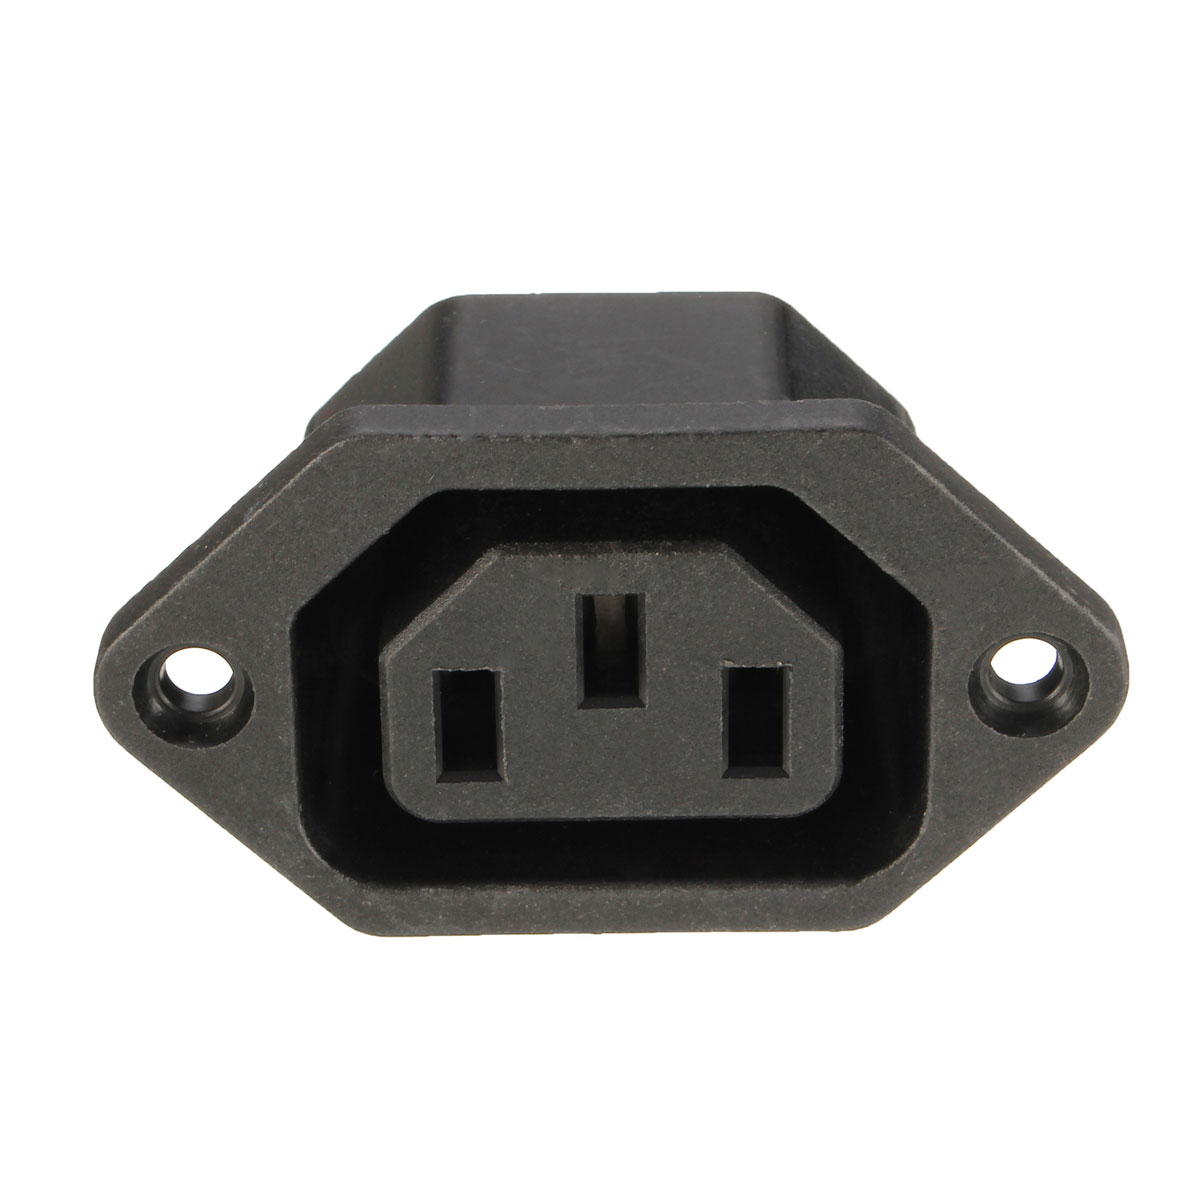 NEW 10pcs Chassis Female 15A//250V AC IEC Inline Socket Plug Adapter Mains Powe